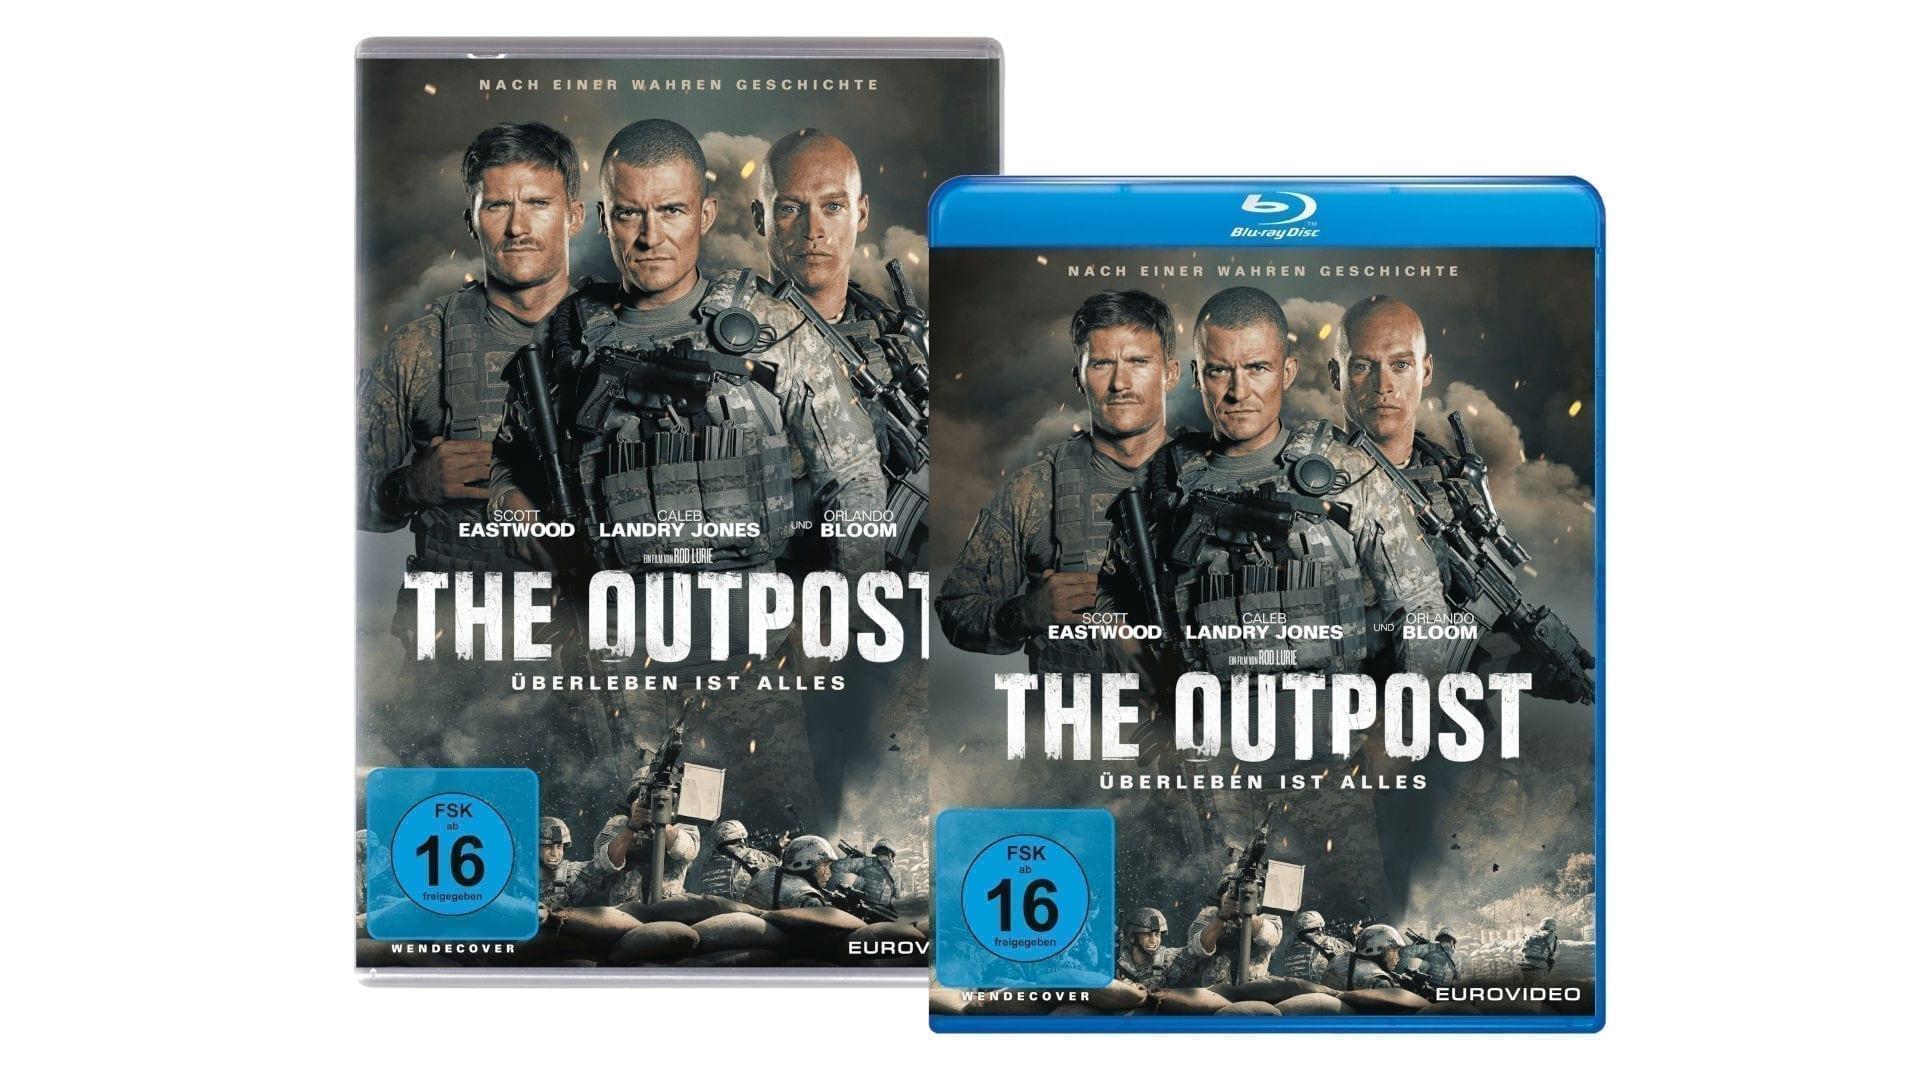 The Outpost DVD und Blu-ray